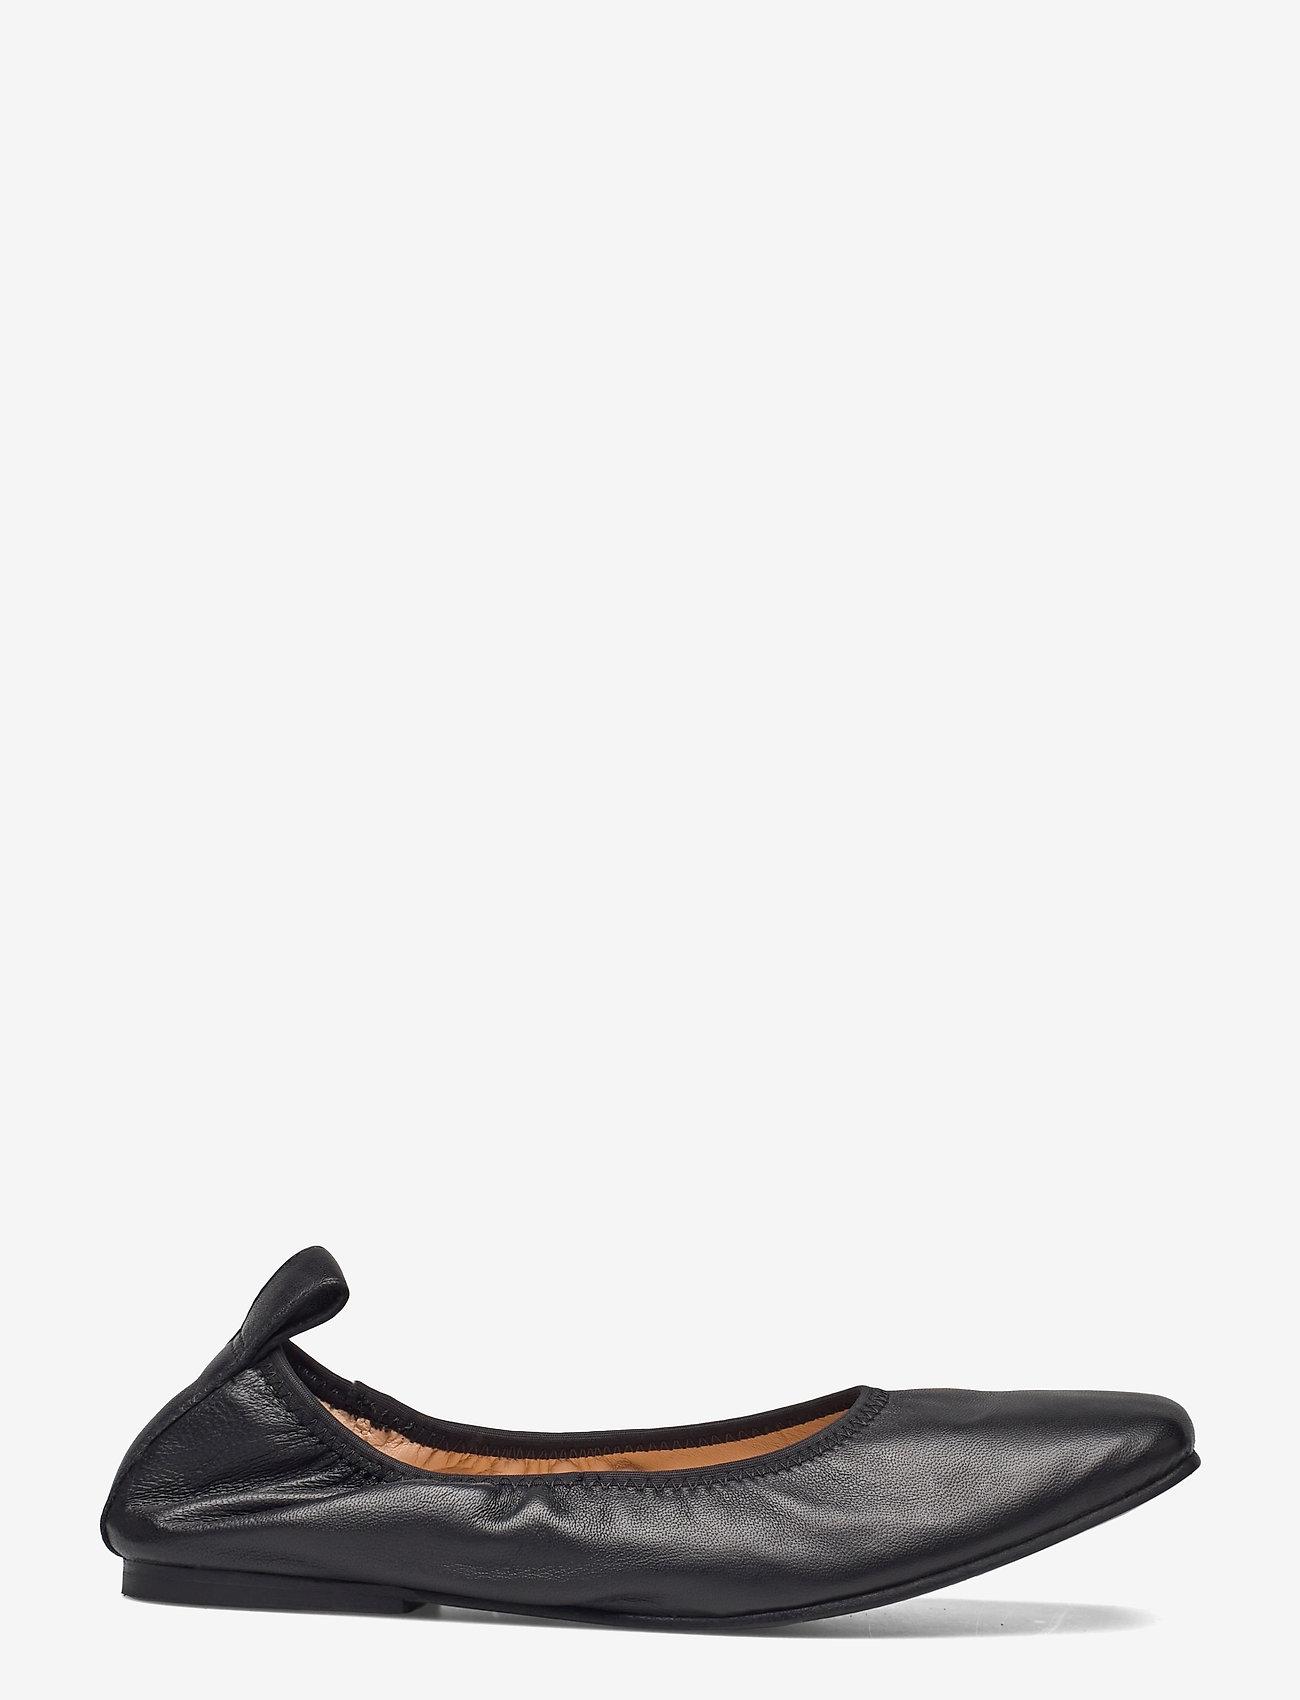 Clarks - Pure Ballet - ballerinas - black leather - 1